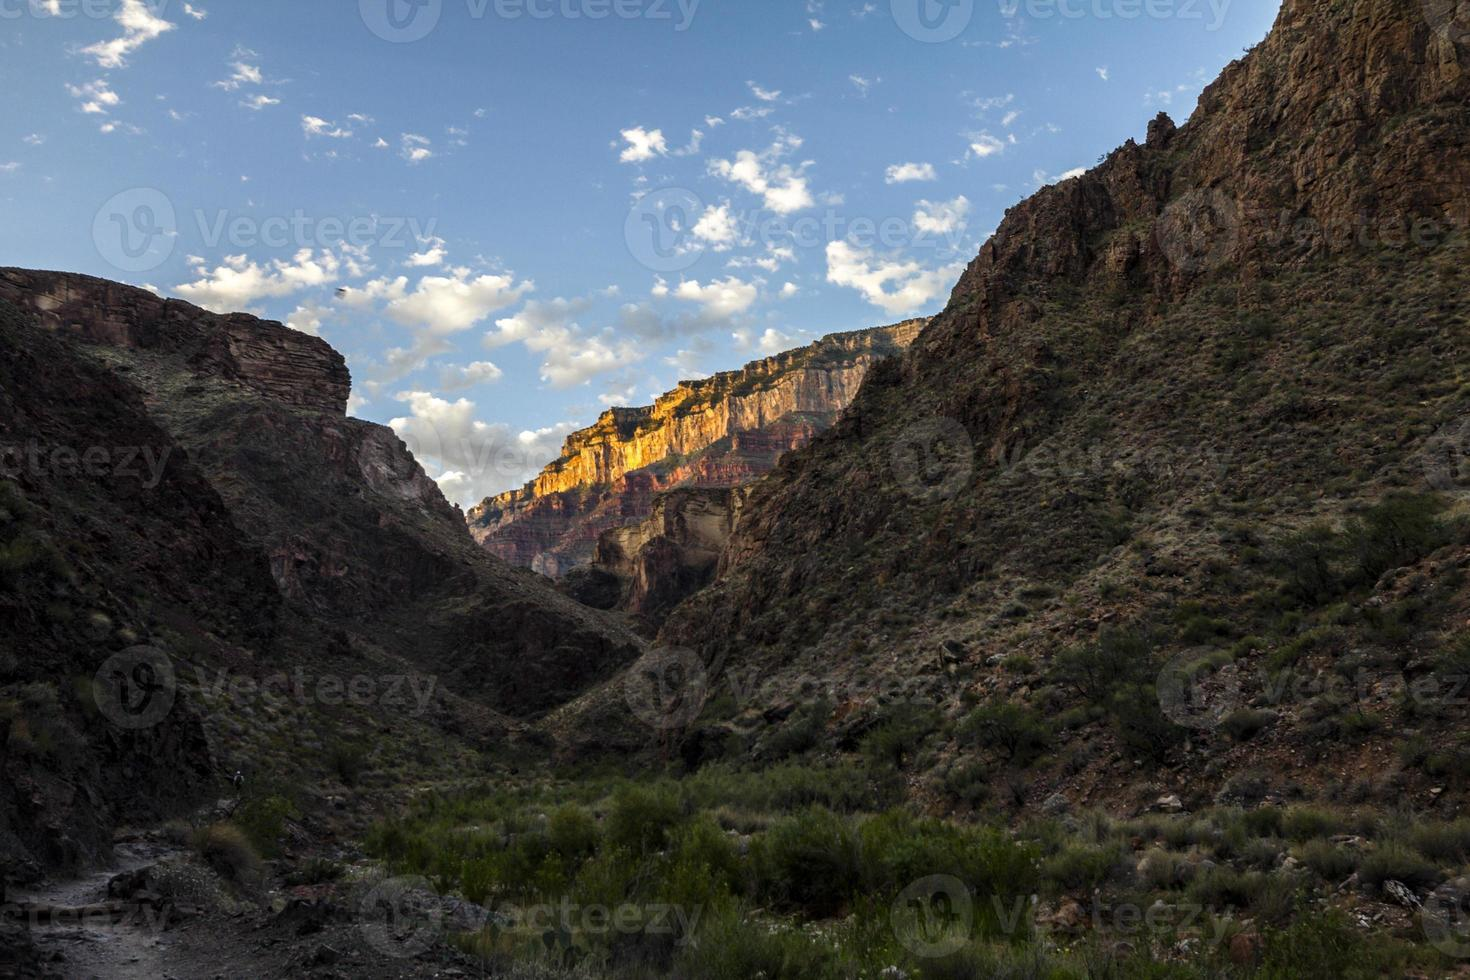 grand canyon landschap overzicht op parcours foto